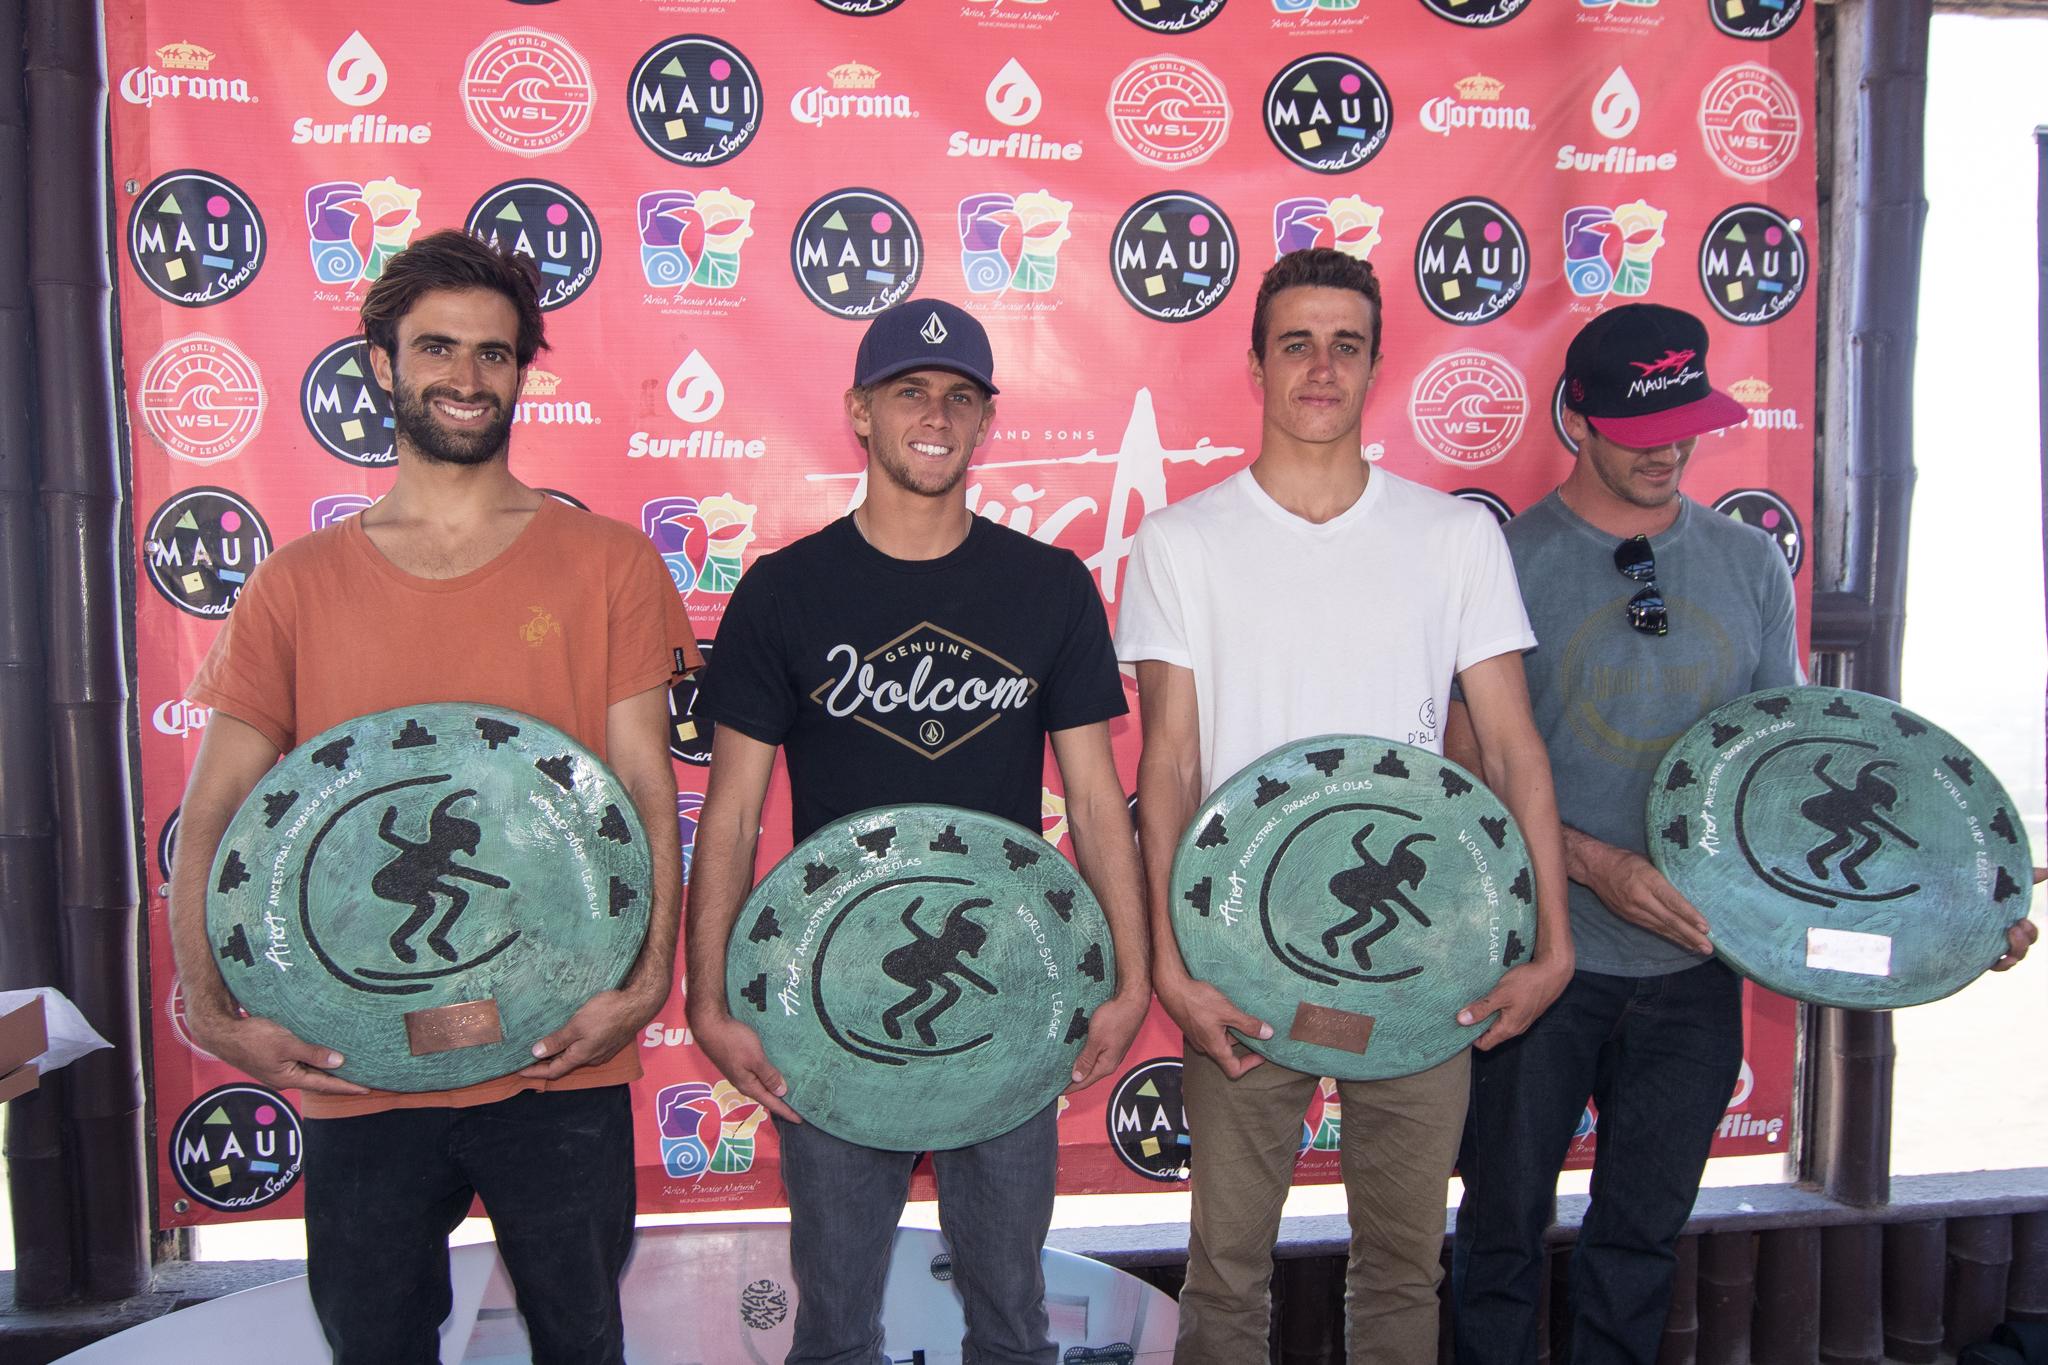 Semfinalistas em 2015 / Foto Pablo Jimenez